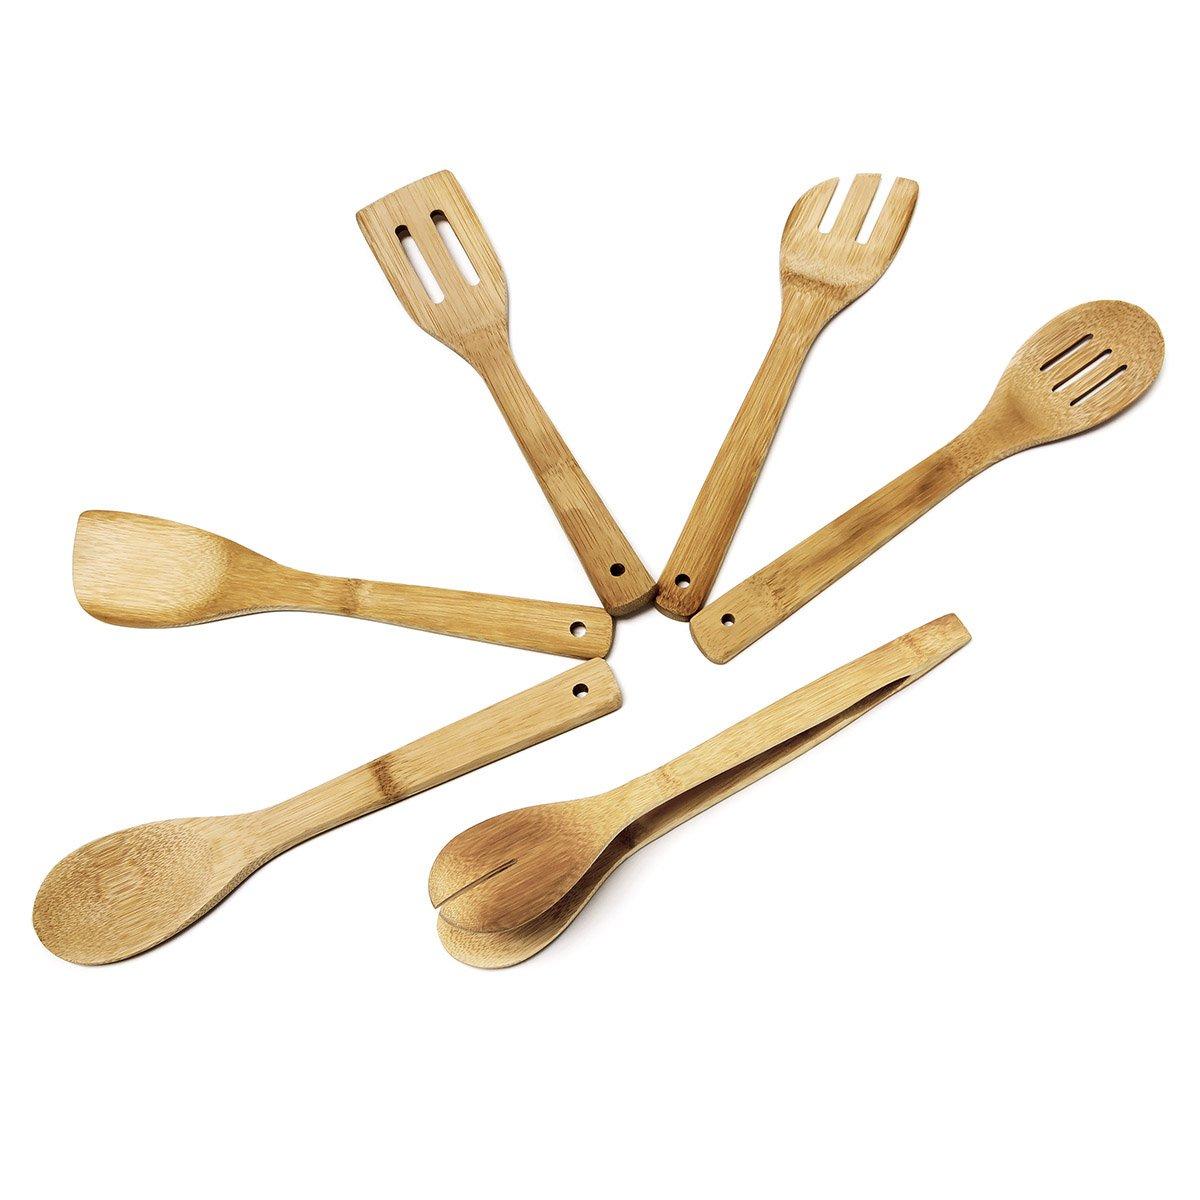 Relaxdays Küchenhelfer Set Bambus 7-teilig 30 cm lang als Kochlöffel ...